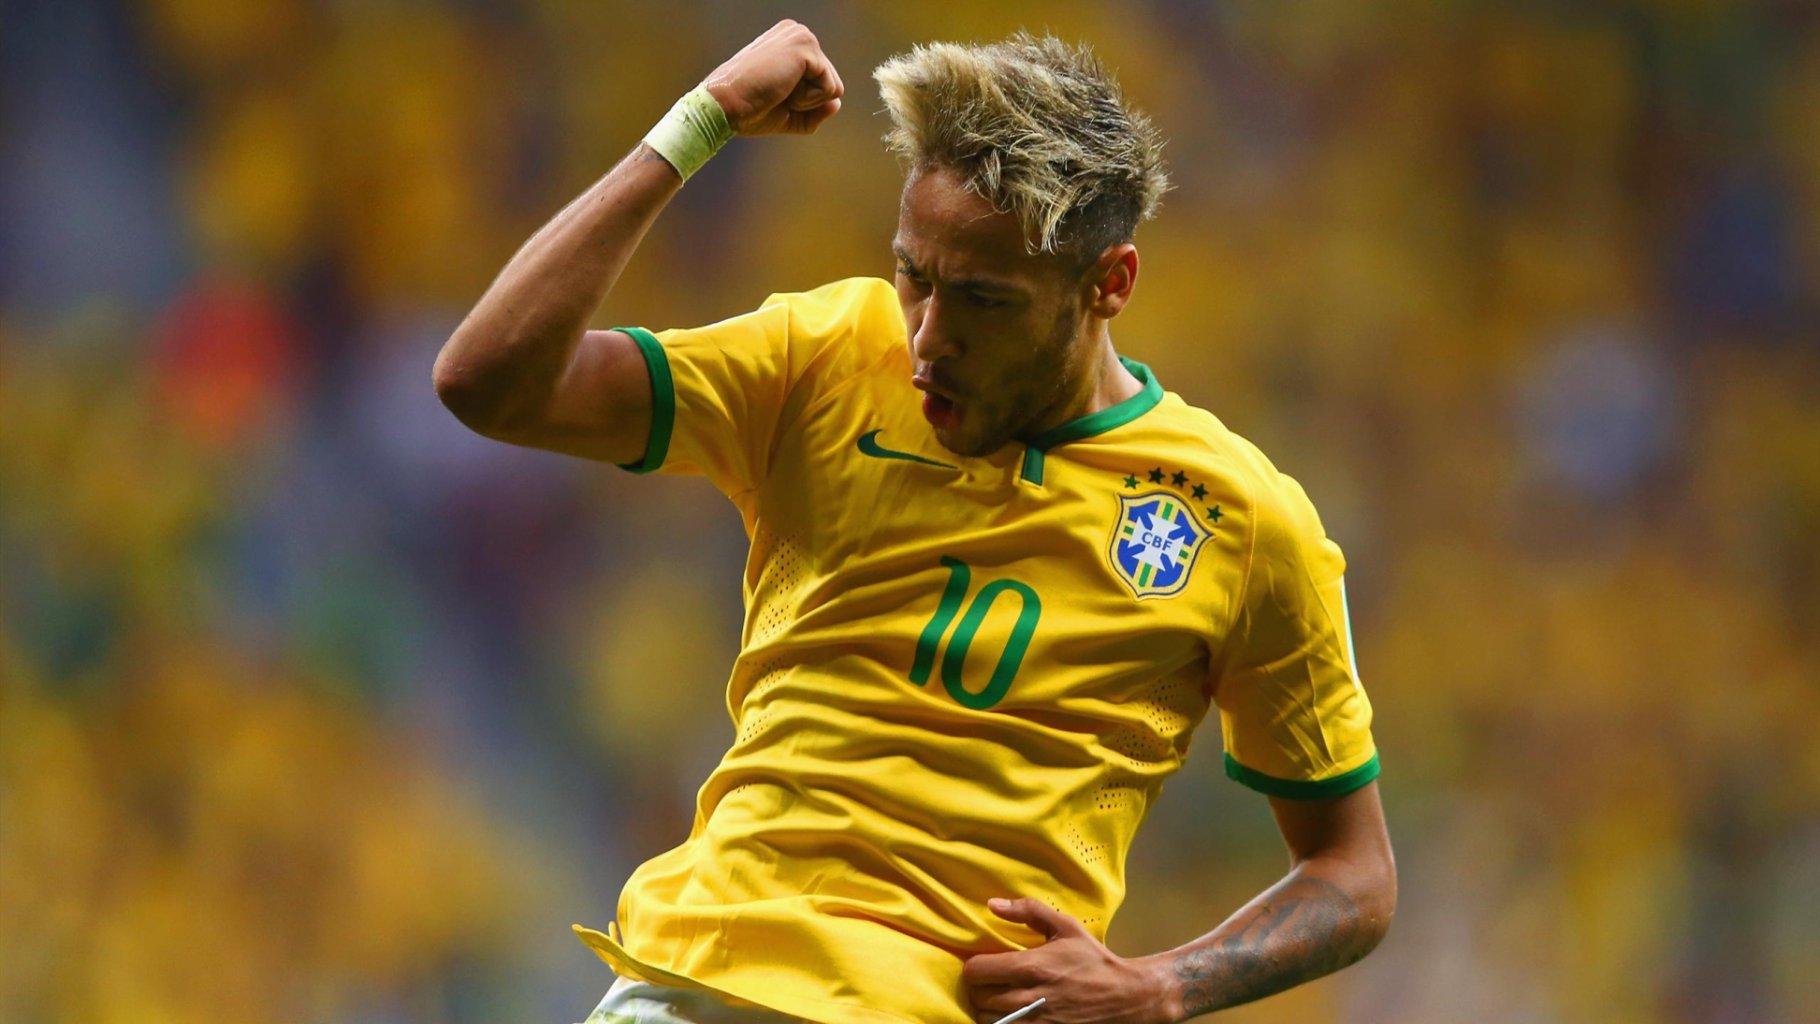 neymar-celebrating-goal-in-brazil-4-1-cameroon-fifa-world-cup-2014